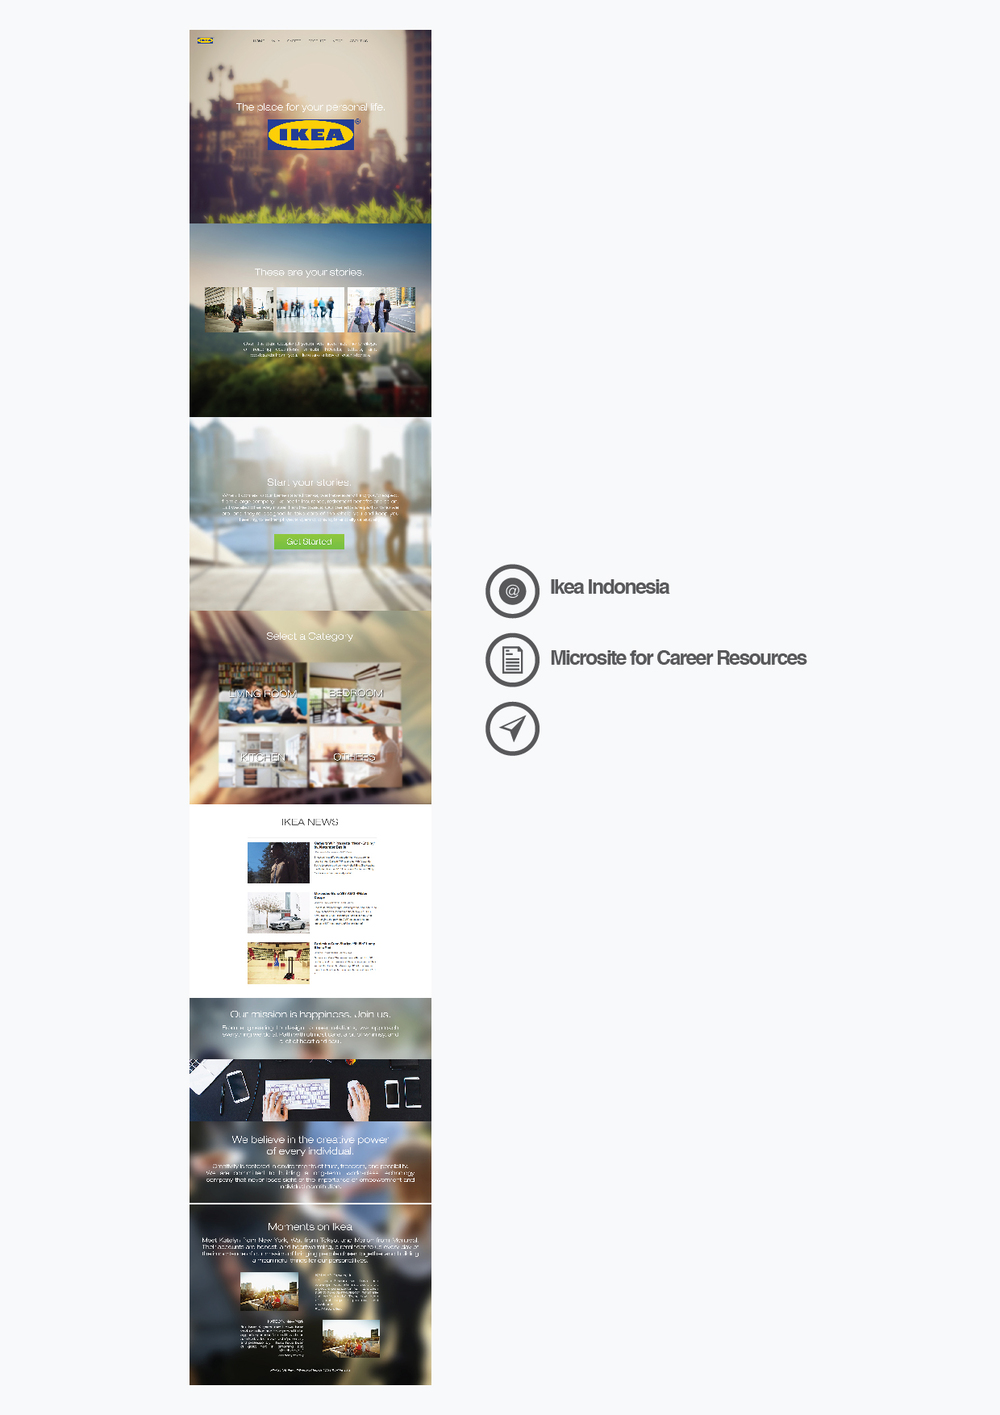 Ikea Indonesia Career Resources